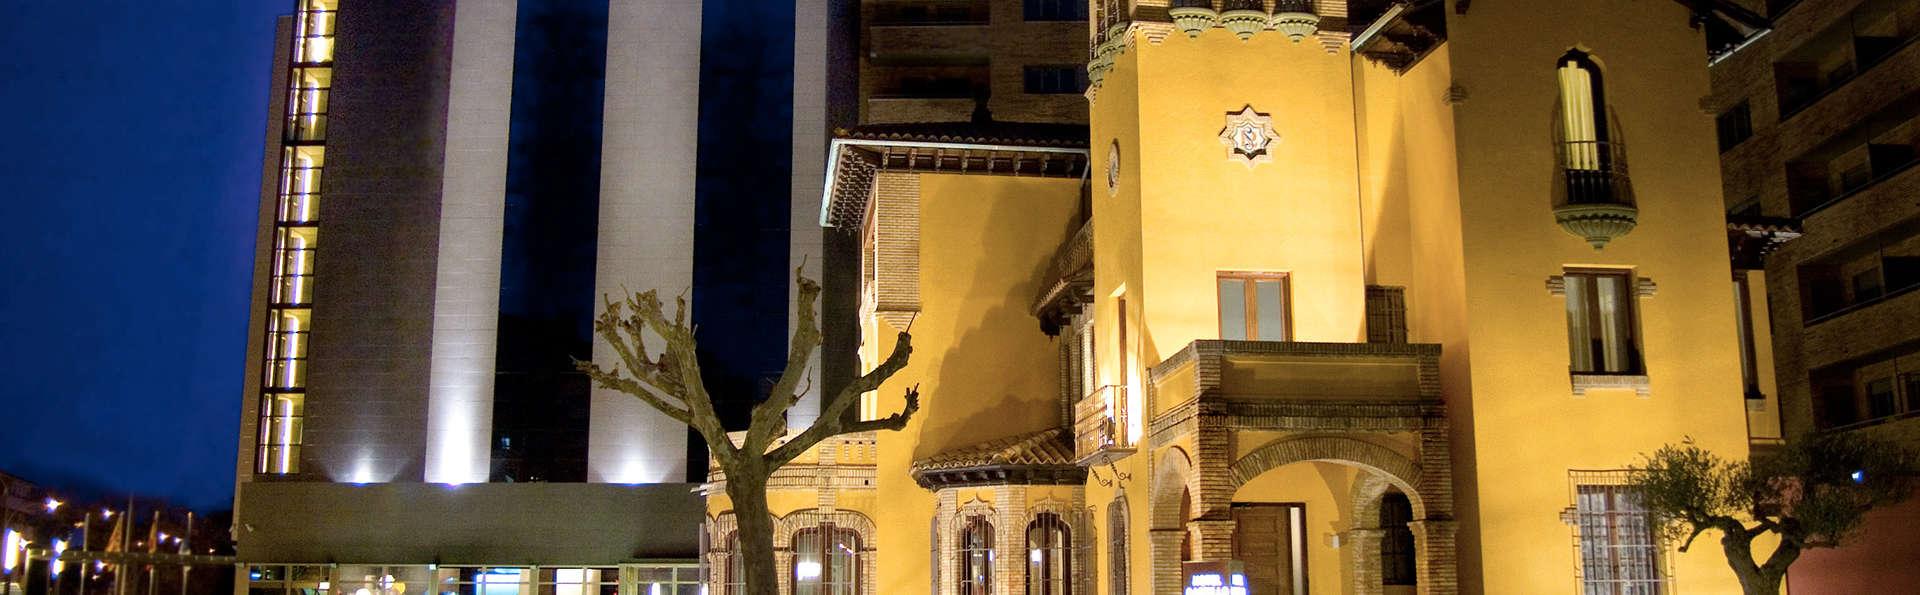 Hotel castillo de ayud h tel de charme calatayud - Castillo de ayud ...